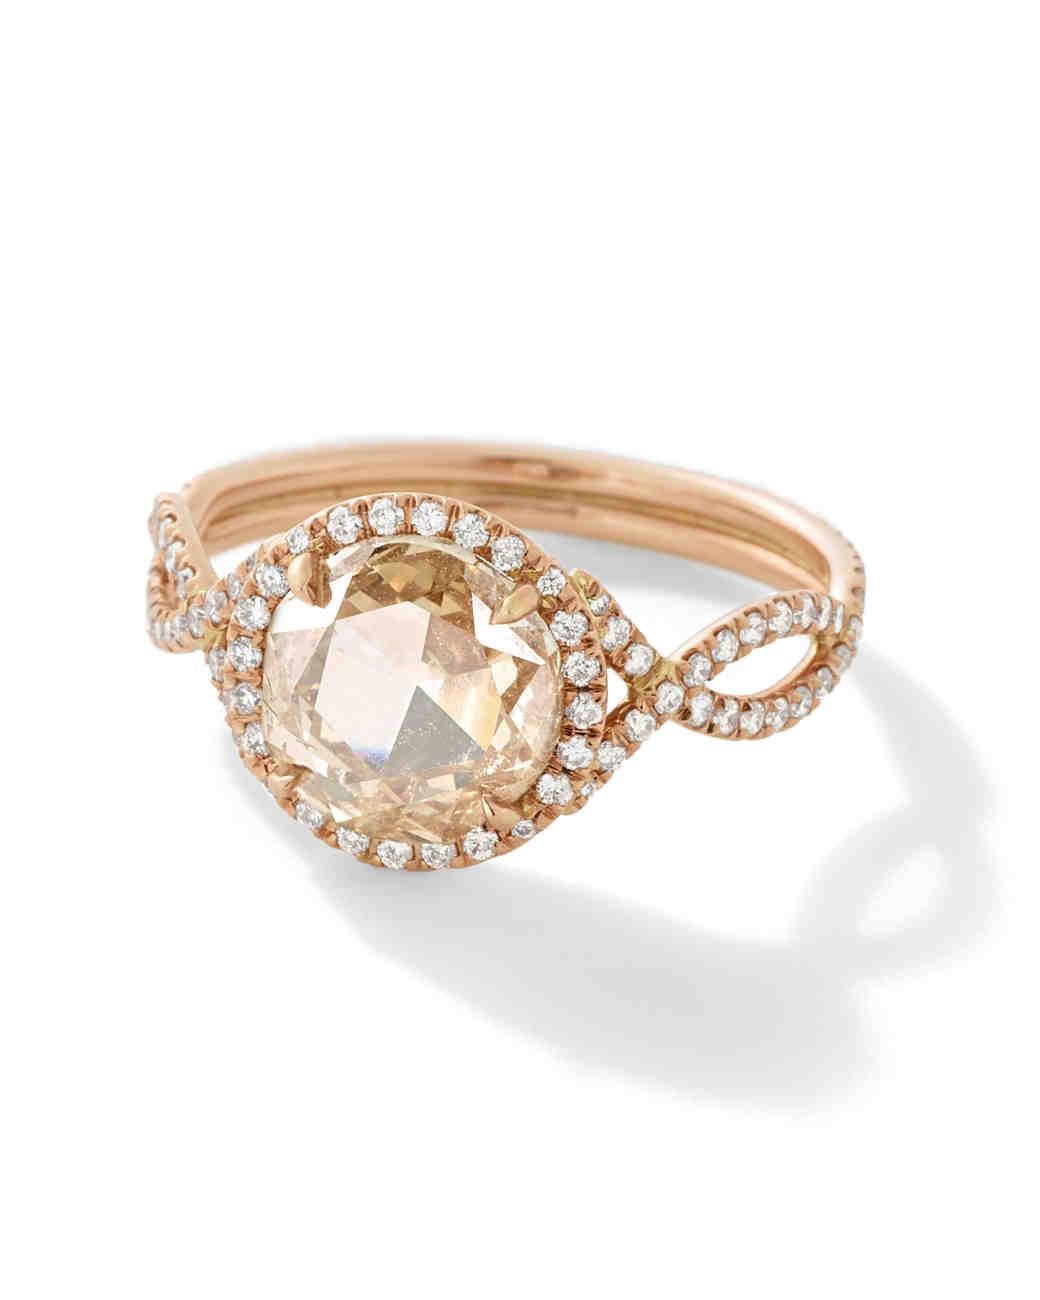 new-engagement-ring-designers-monique-pean-champagne-0515.jpg